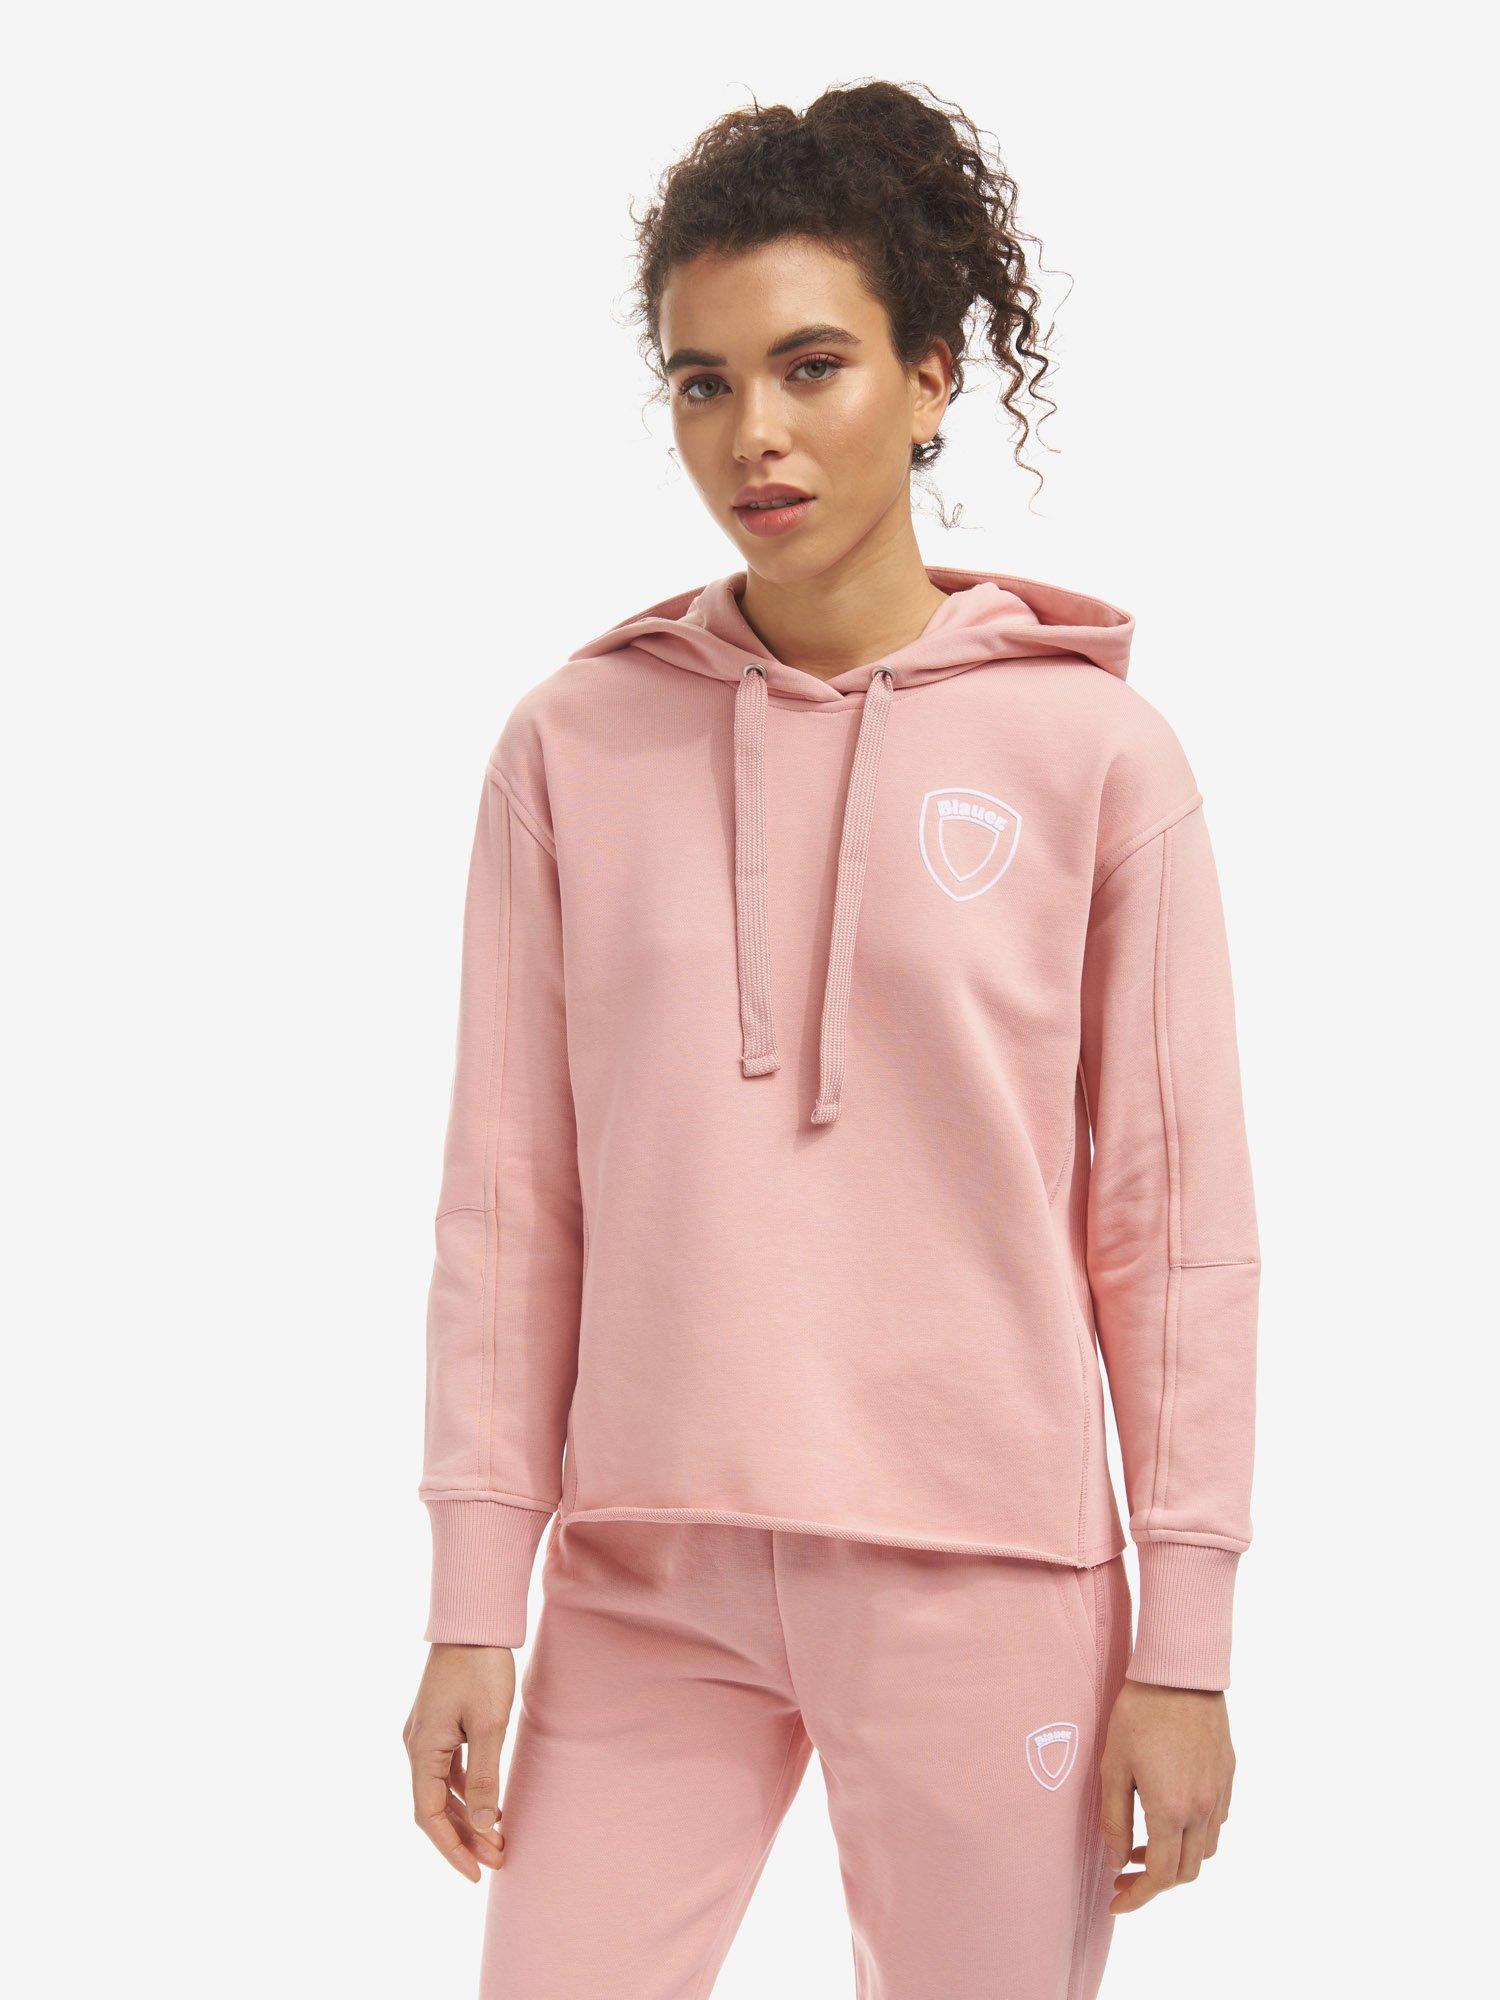 Blauer - SUDADERA CERRADA CON CAPUCHA - Soft Pink - Blauer